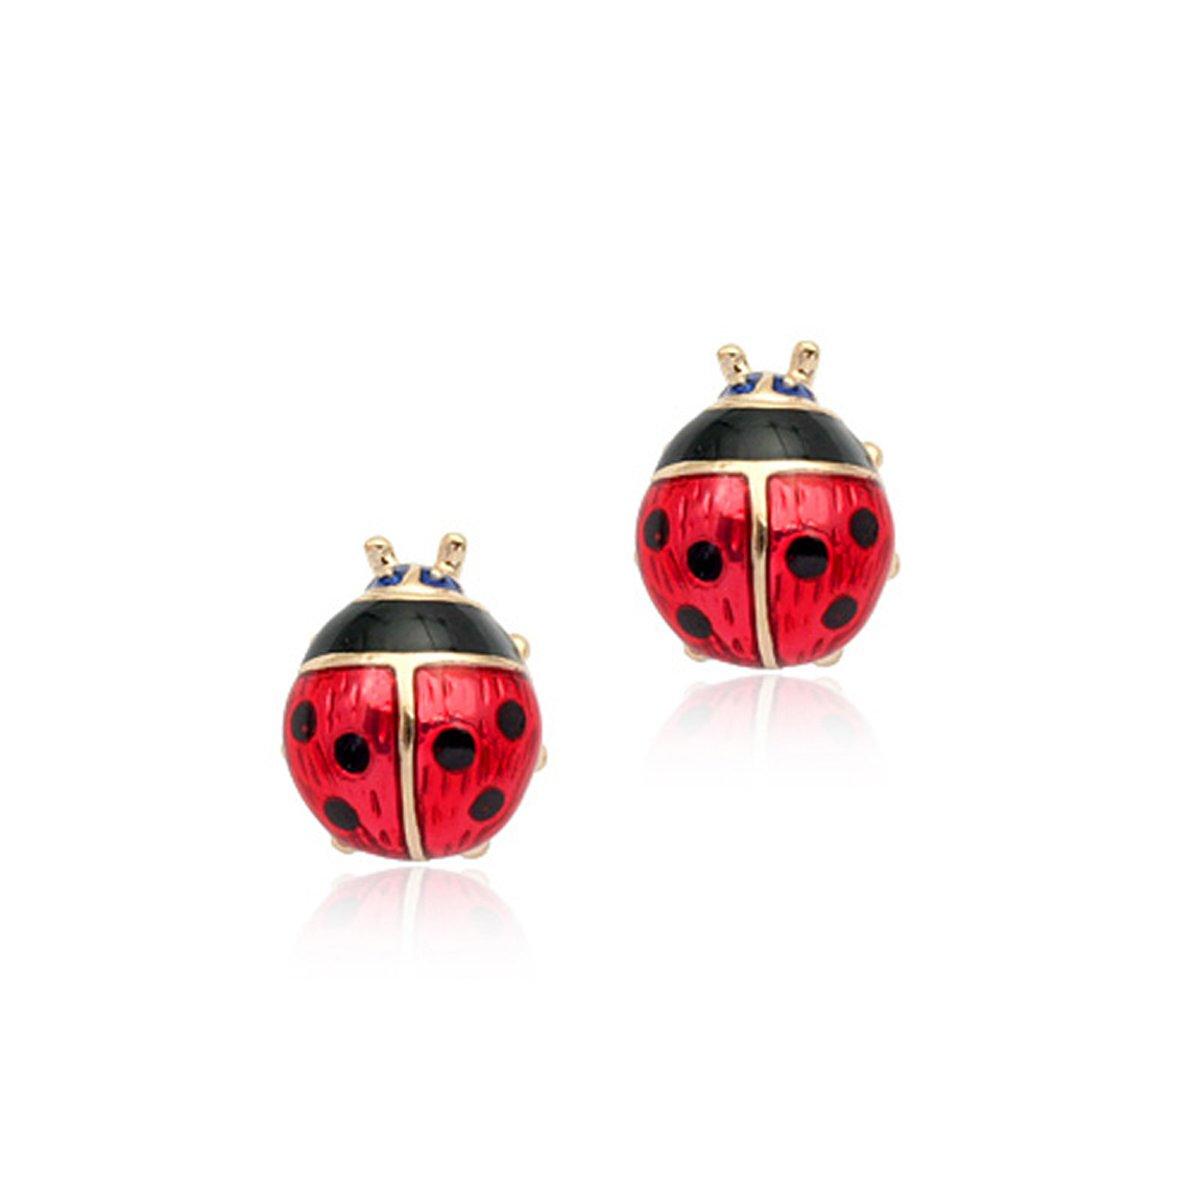 18k Gold Plated Enamel Red Spotty Beetle Ladybird Stud Earrings Beetles 10mm Girl Jewellery Gift UK